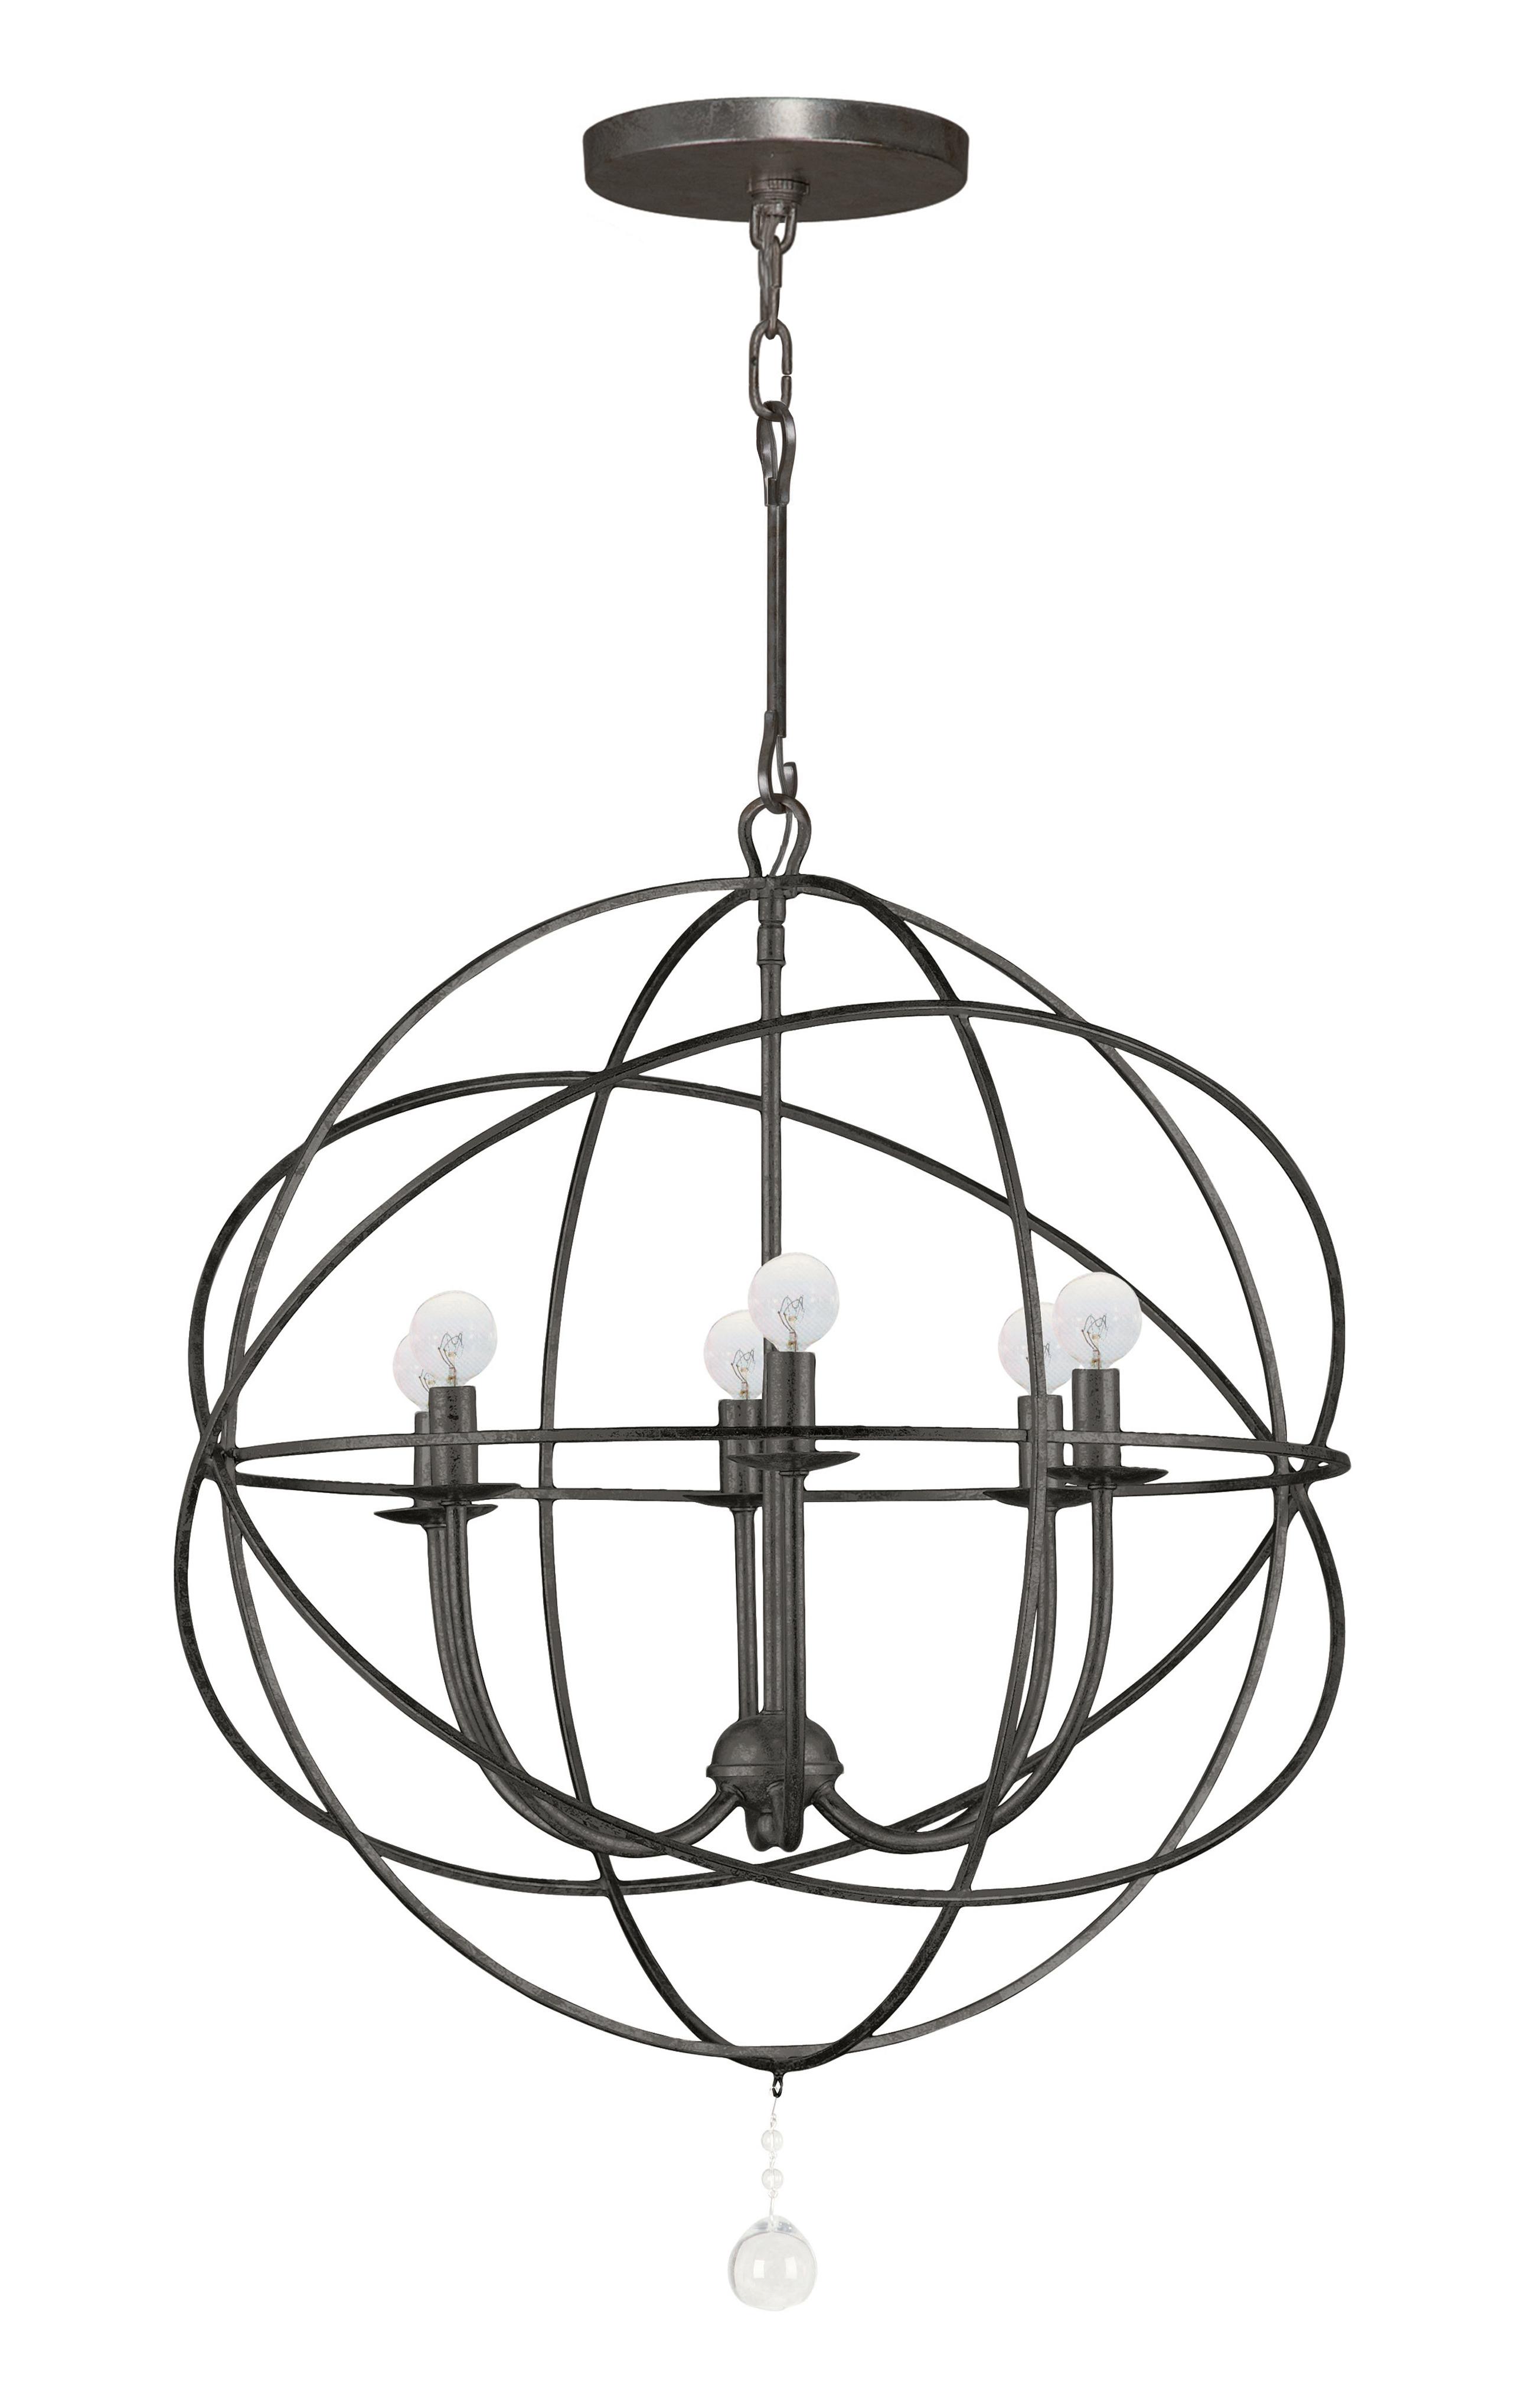 Gregoire 6 Light Globe Chandelier Pertaining To Newest Gregoire 6 Light Globe Chandeliers (Gallery 3 of 20)